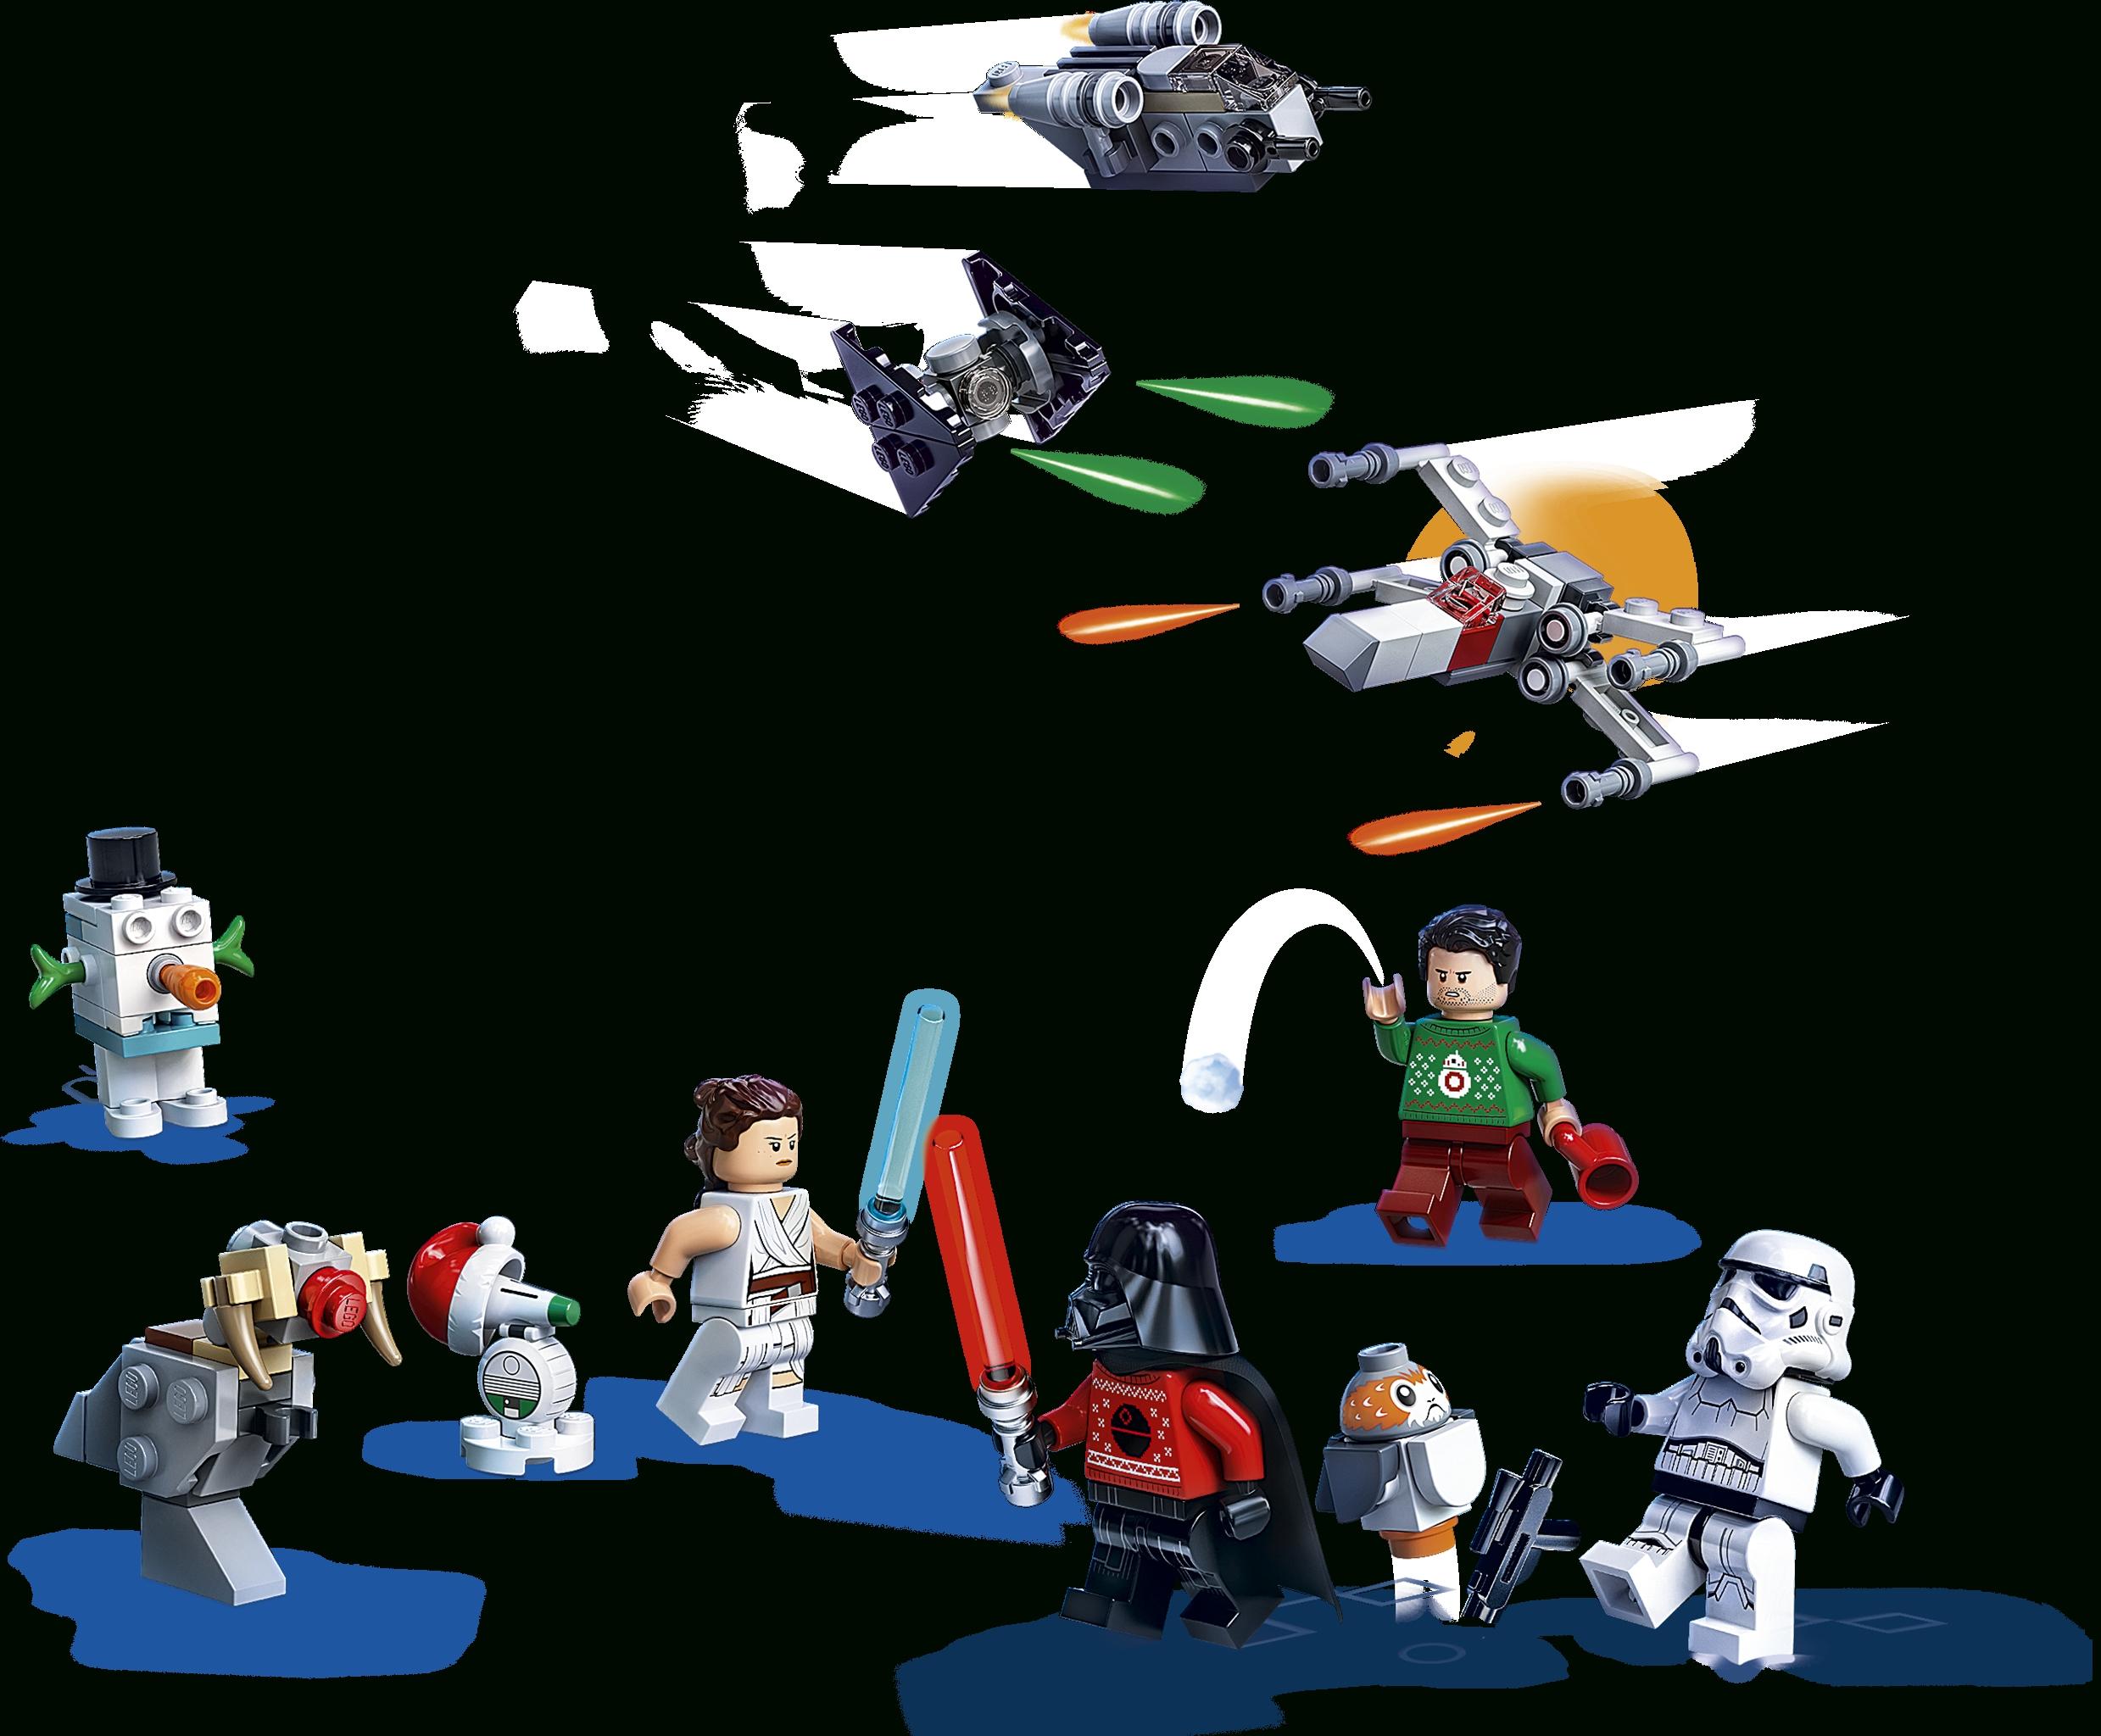 Catch Lego Star Wars Advent Calendar 2021 Code